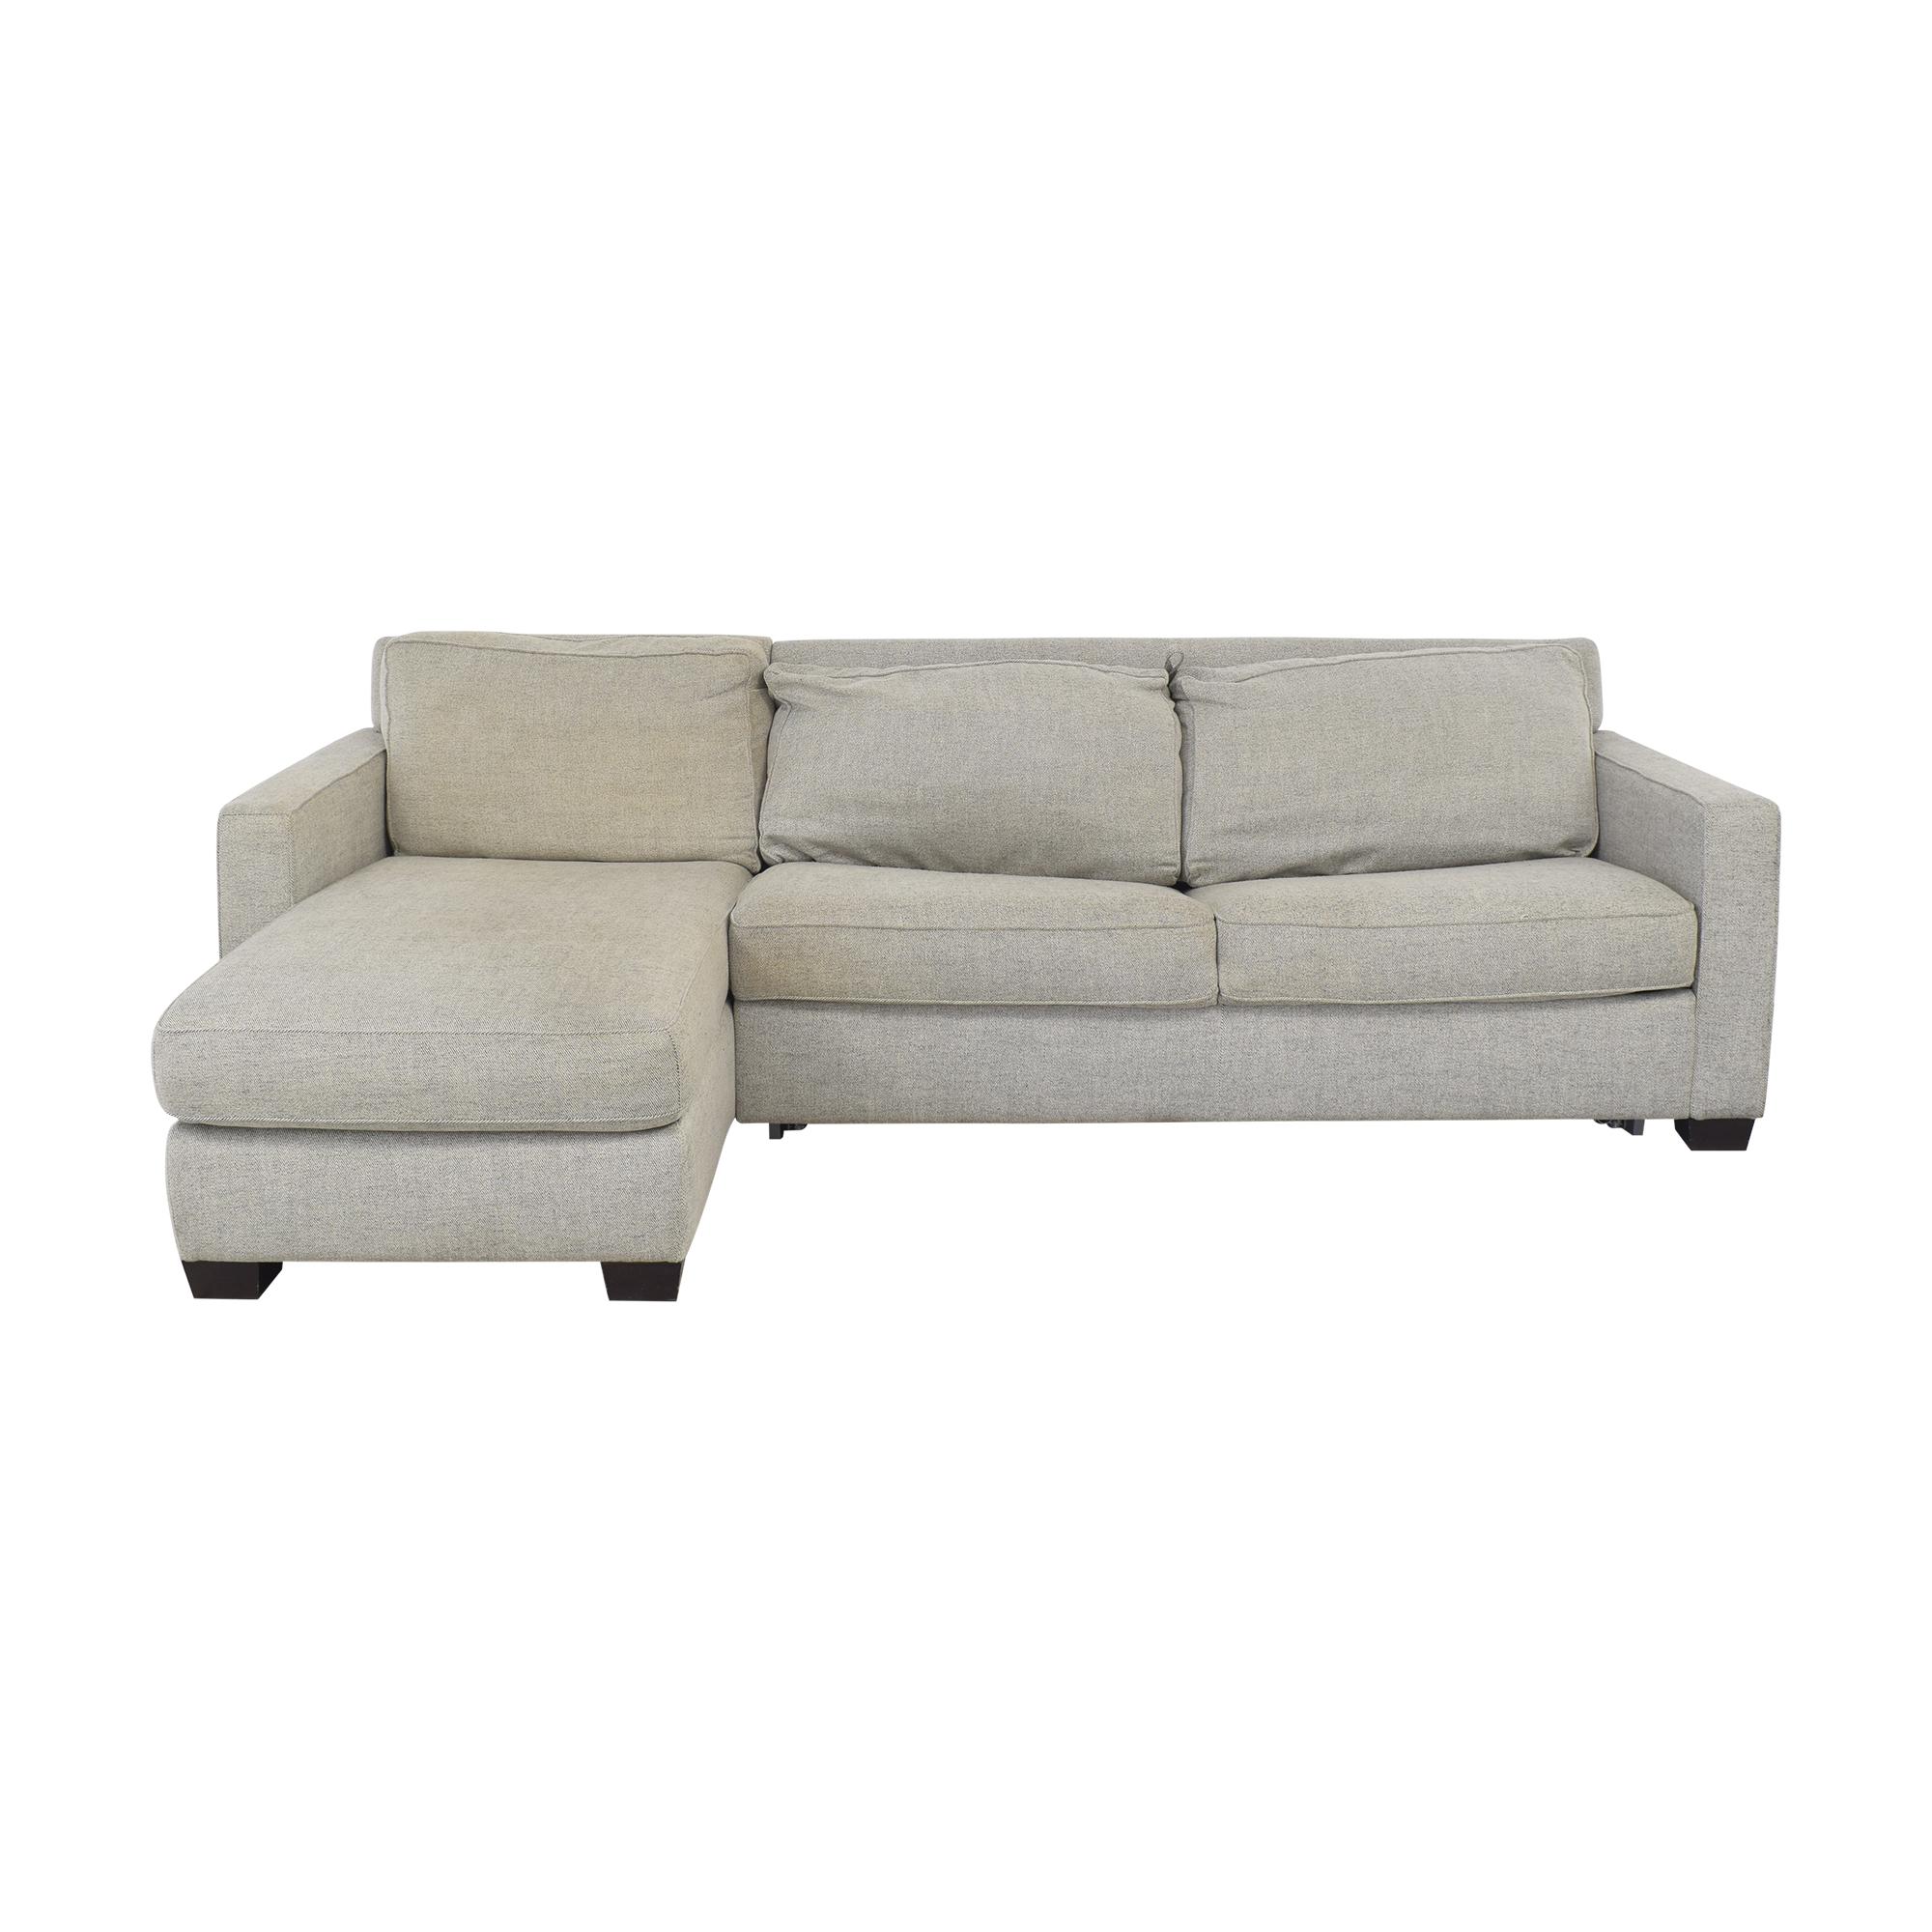 buy West Elm Henry 2-Piece Full Sleeper Storage Sofa West Elm